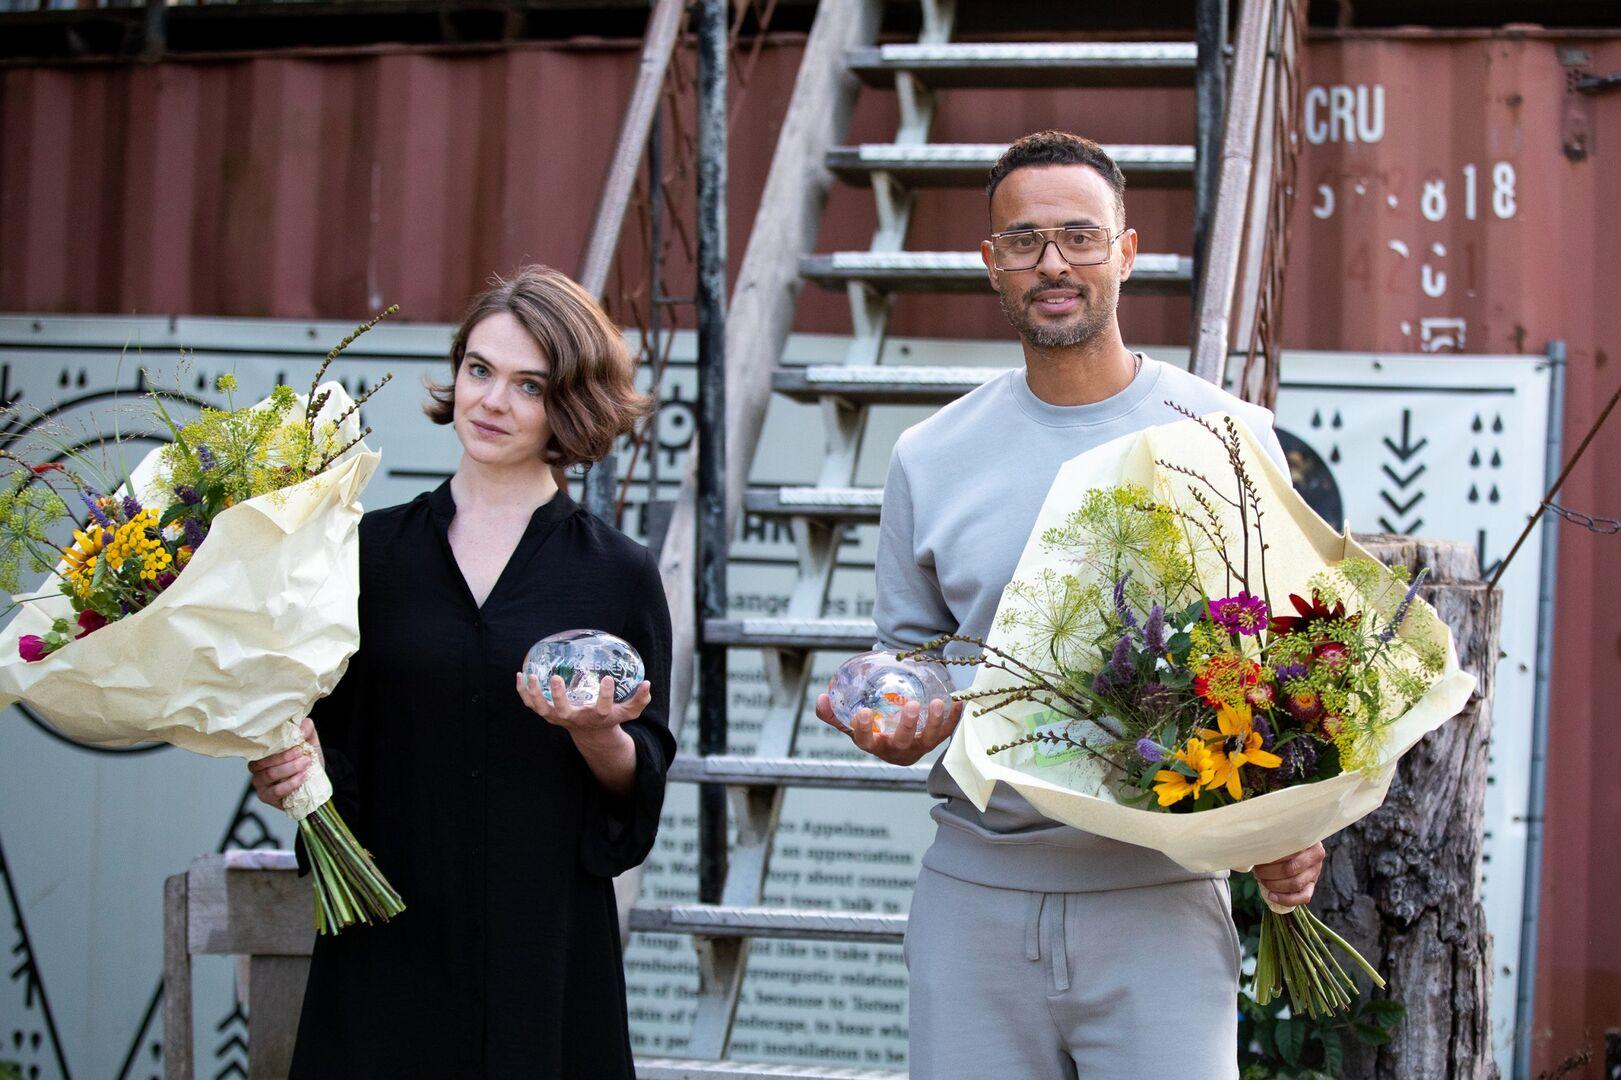 PLANmaker Katja Heitmann wint Gieskes-Strijbis Podiumprijs 2020